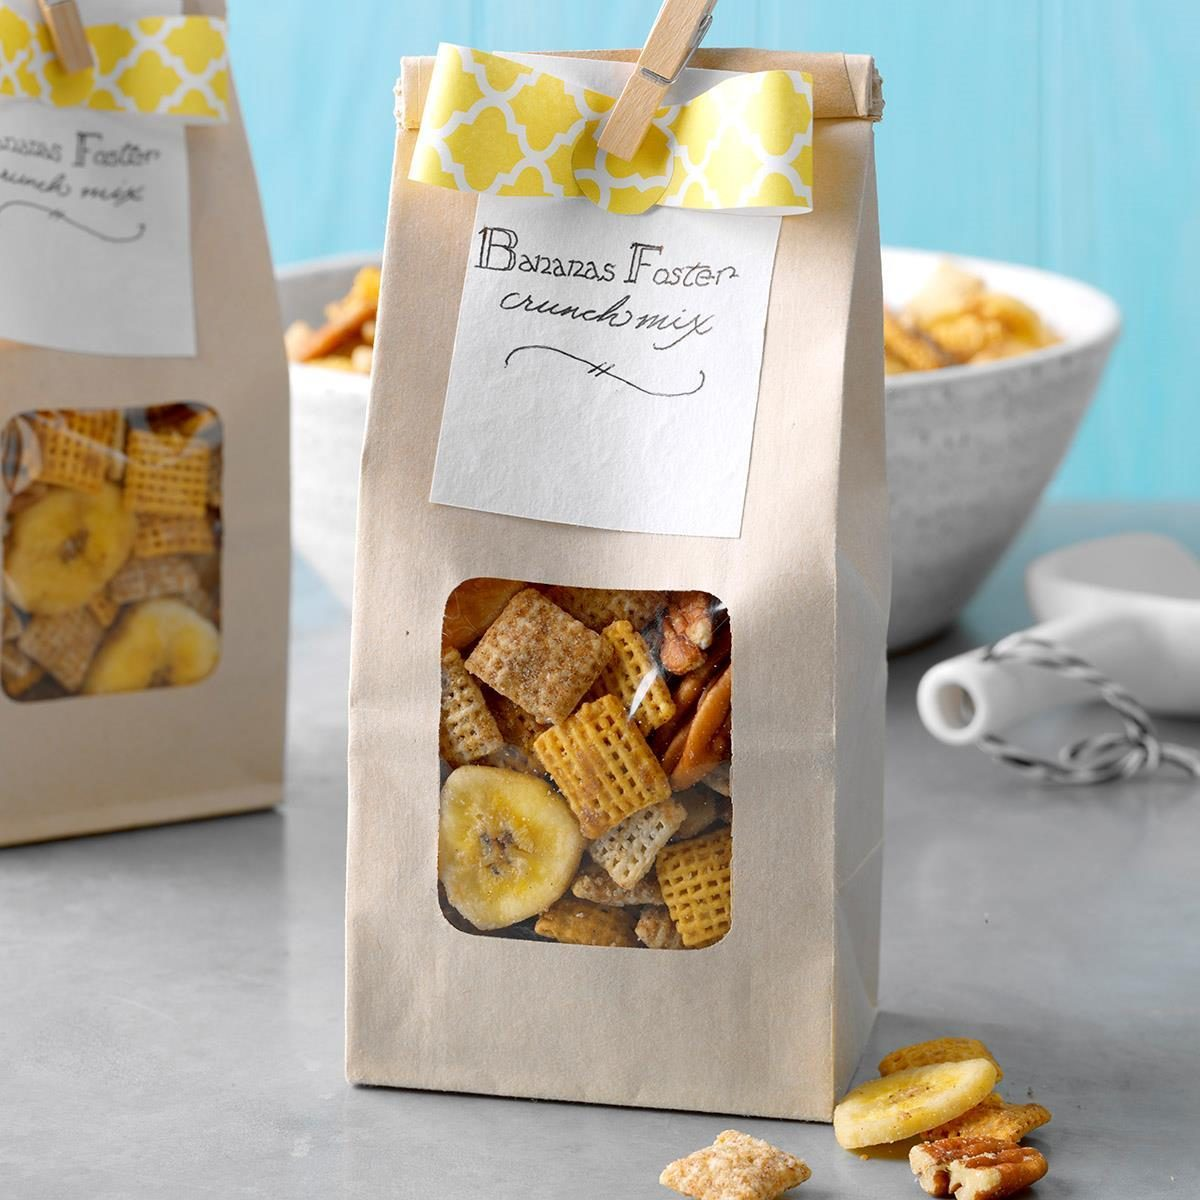 bananas foster crunch mix recipe